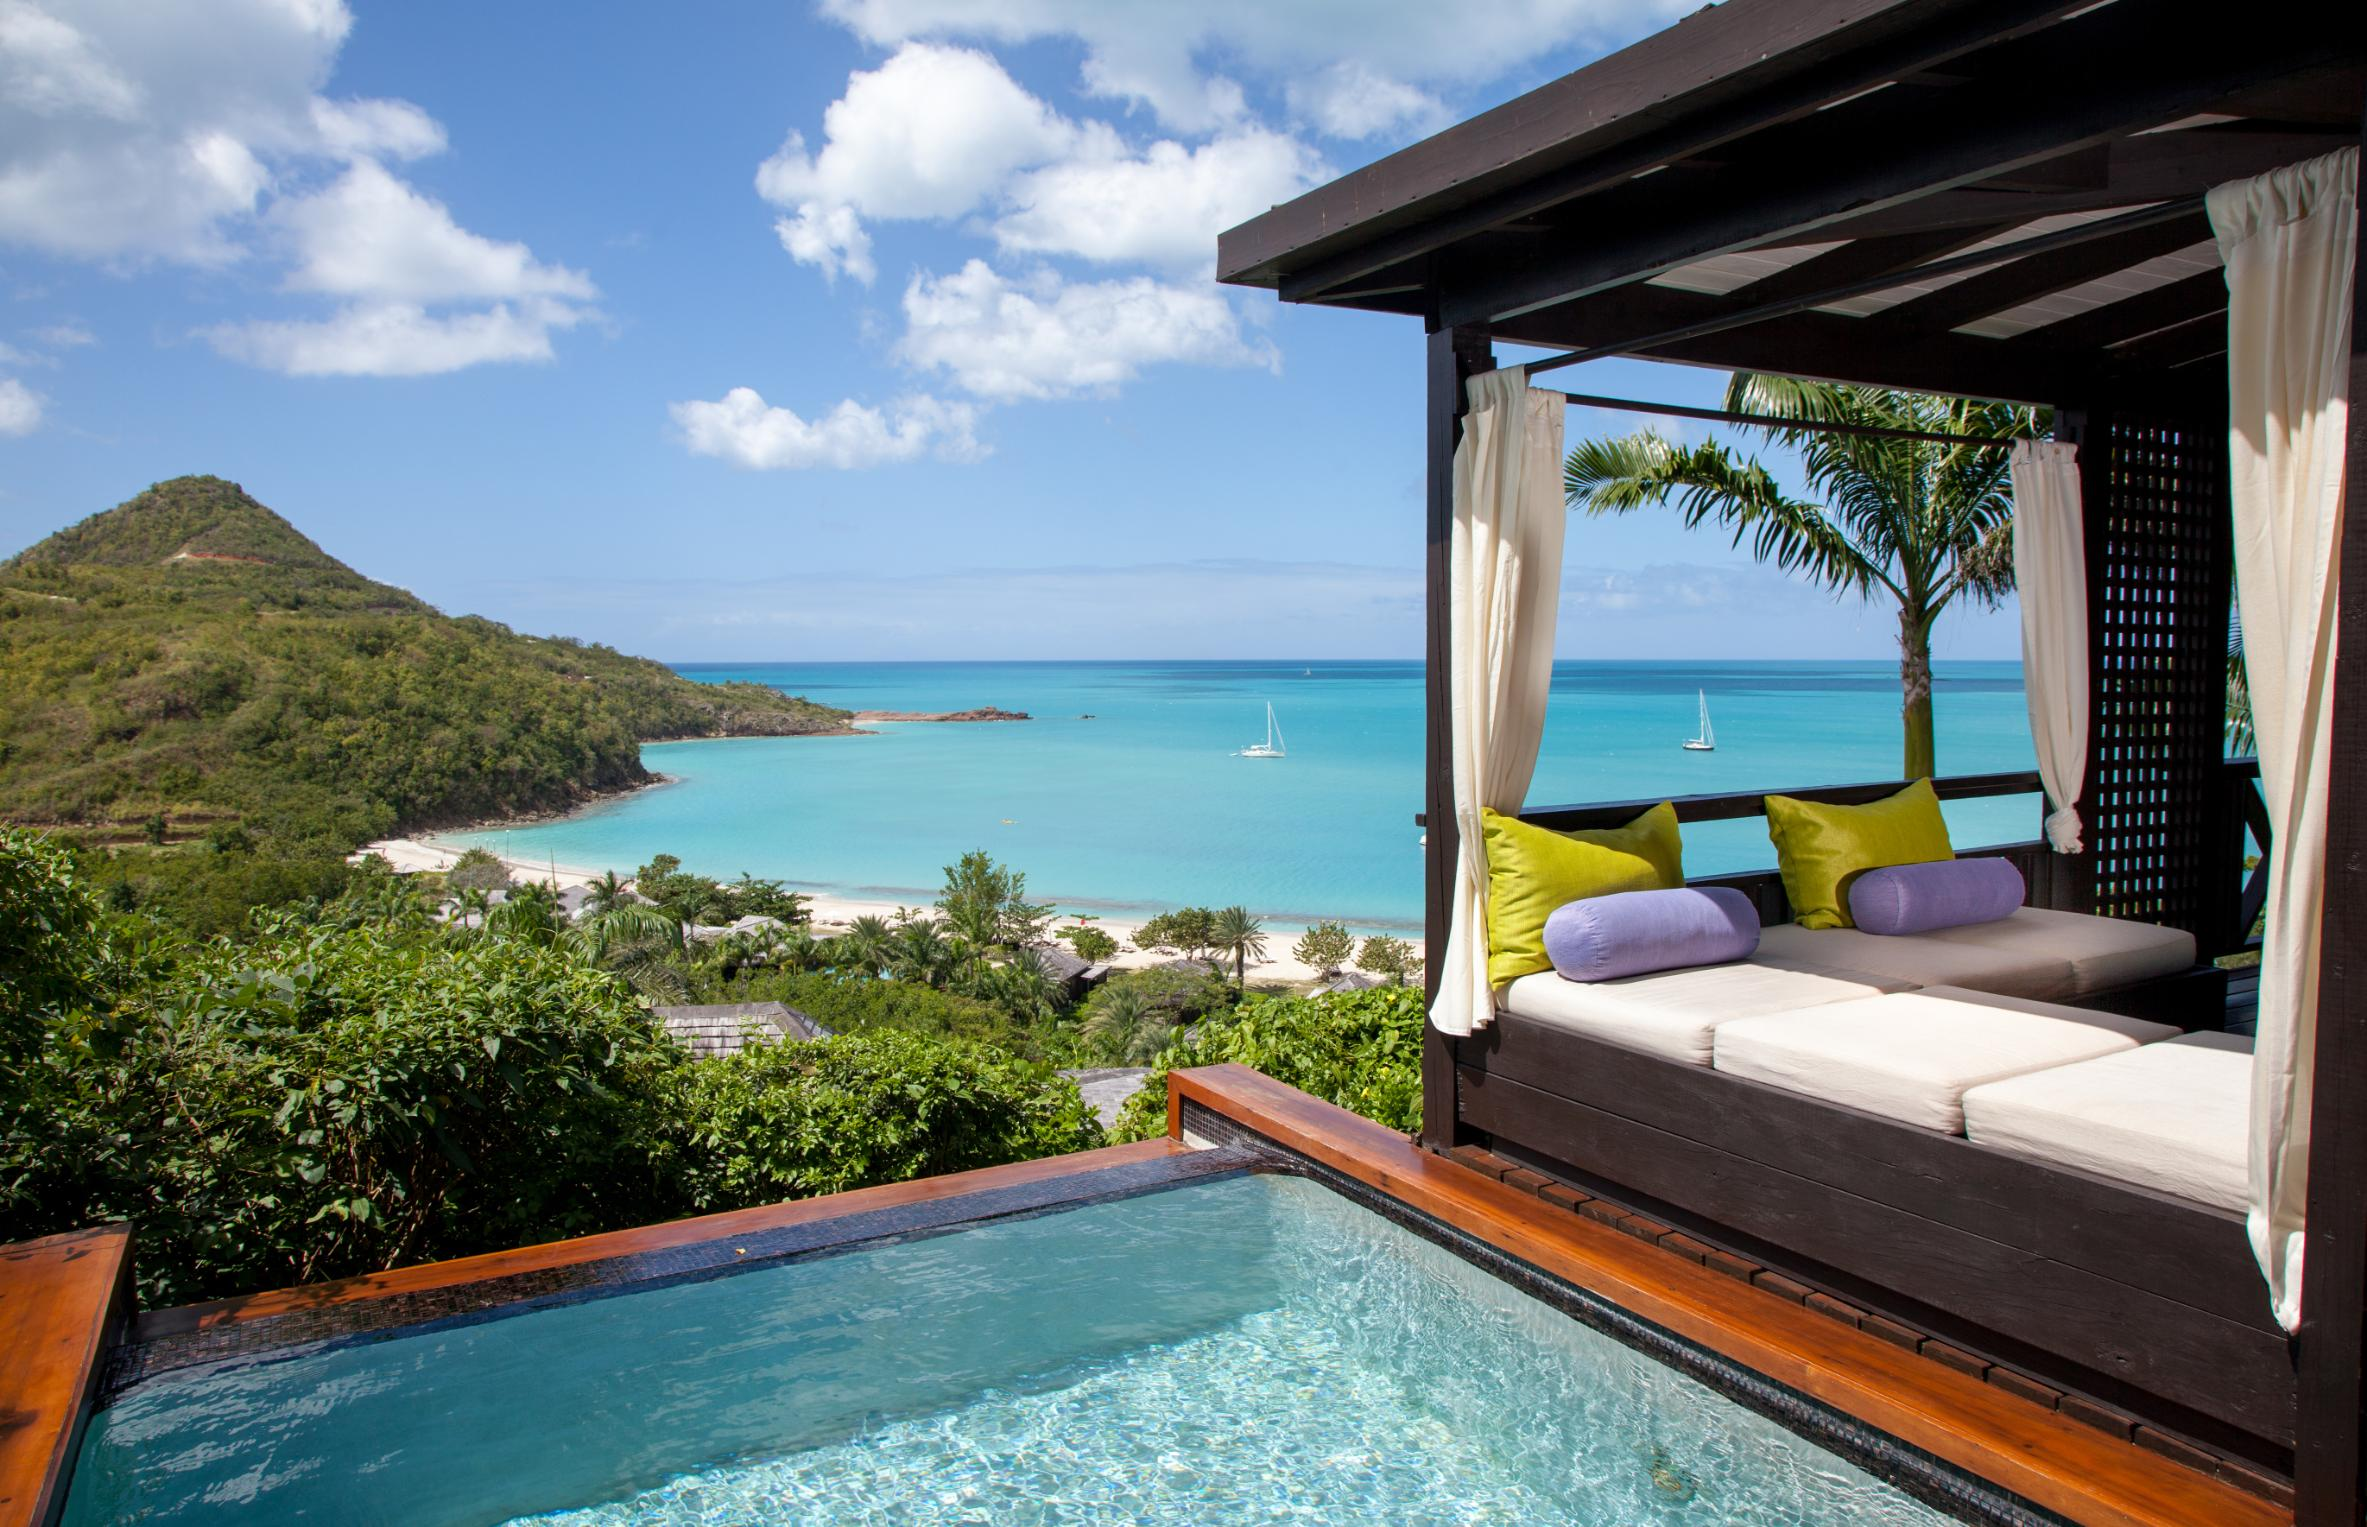 Top 5 Caribbean Destinations for Holidays - Antigua